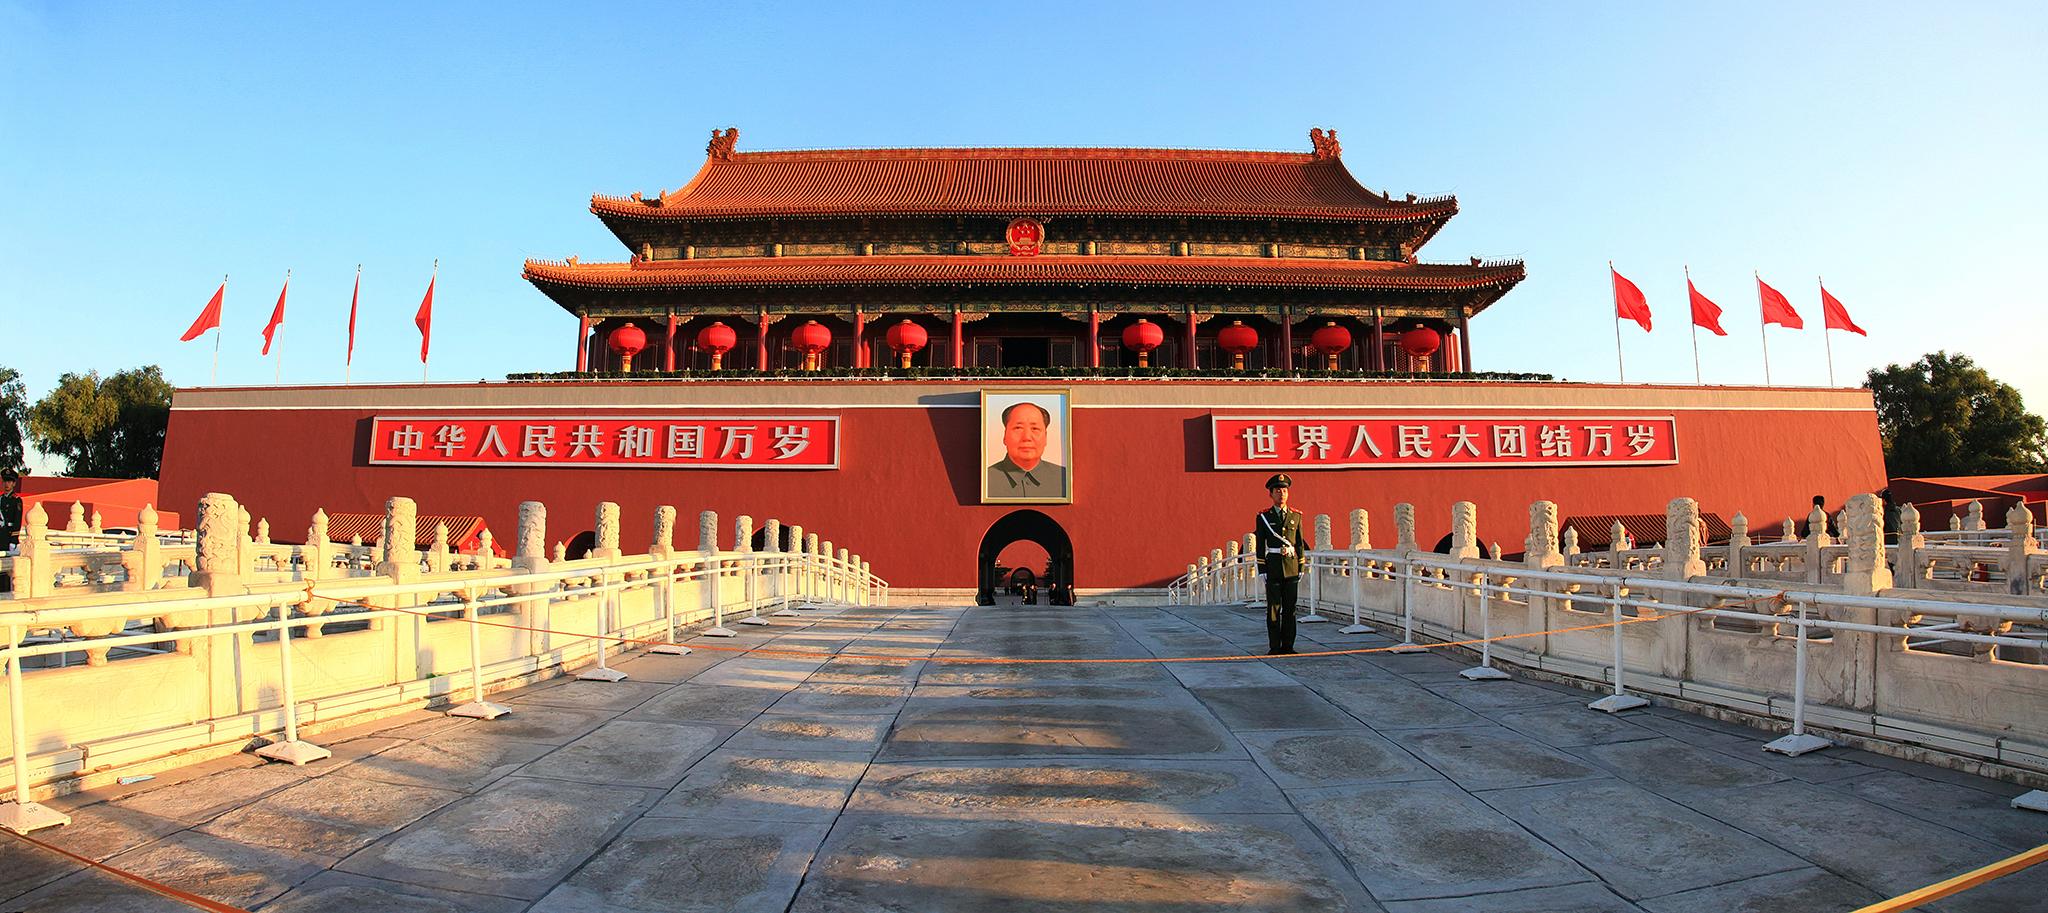 "Filme ""The Great Wall"" é pouco interessante, diz realizador"